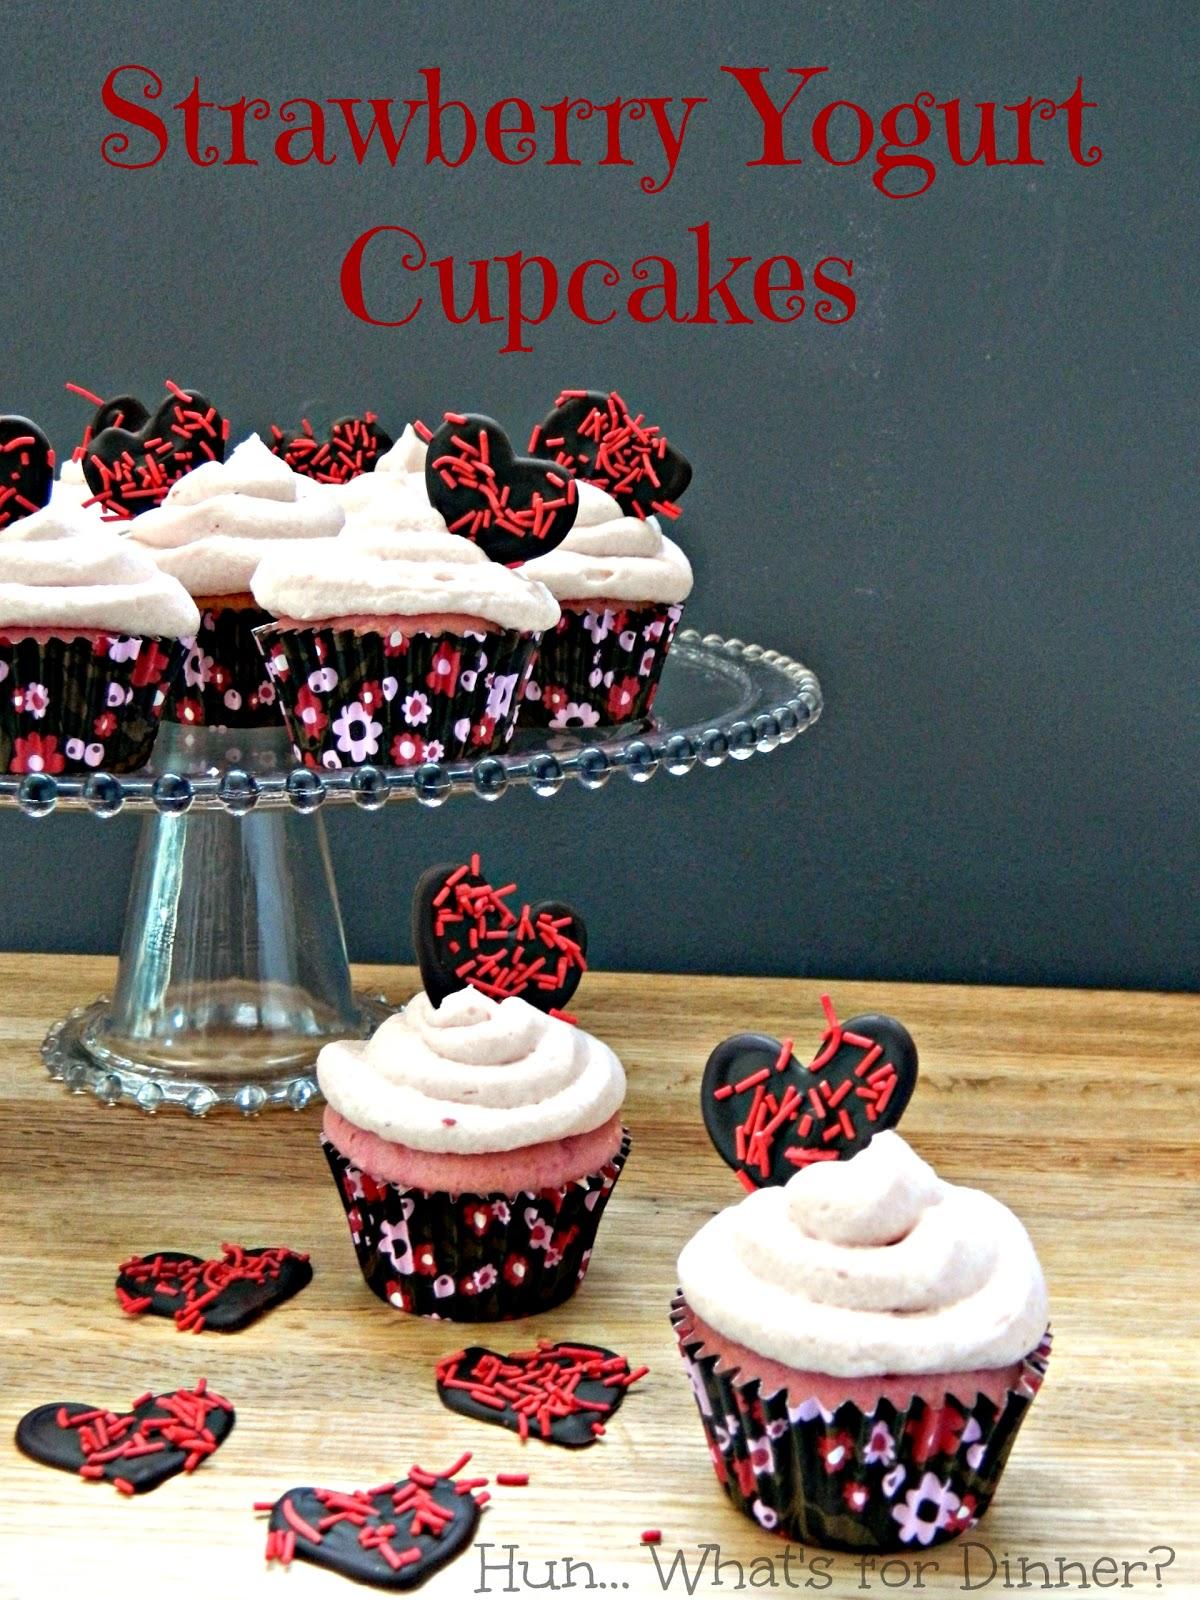 Strawberry Yogurt Cupcakes for Valentine's Day